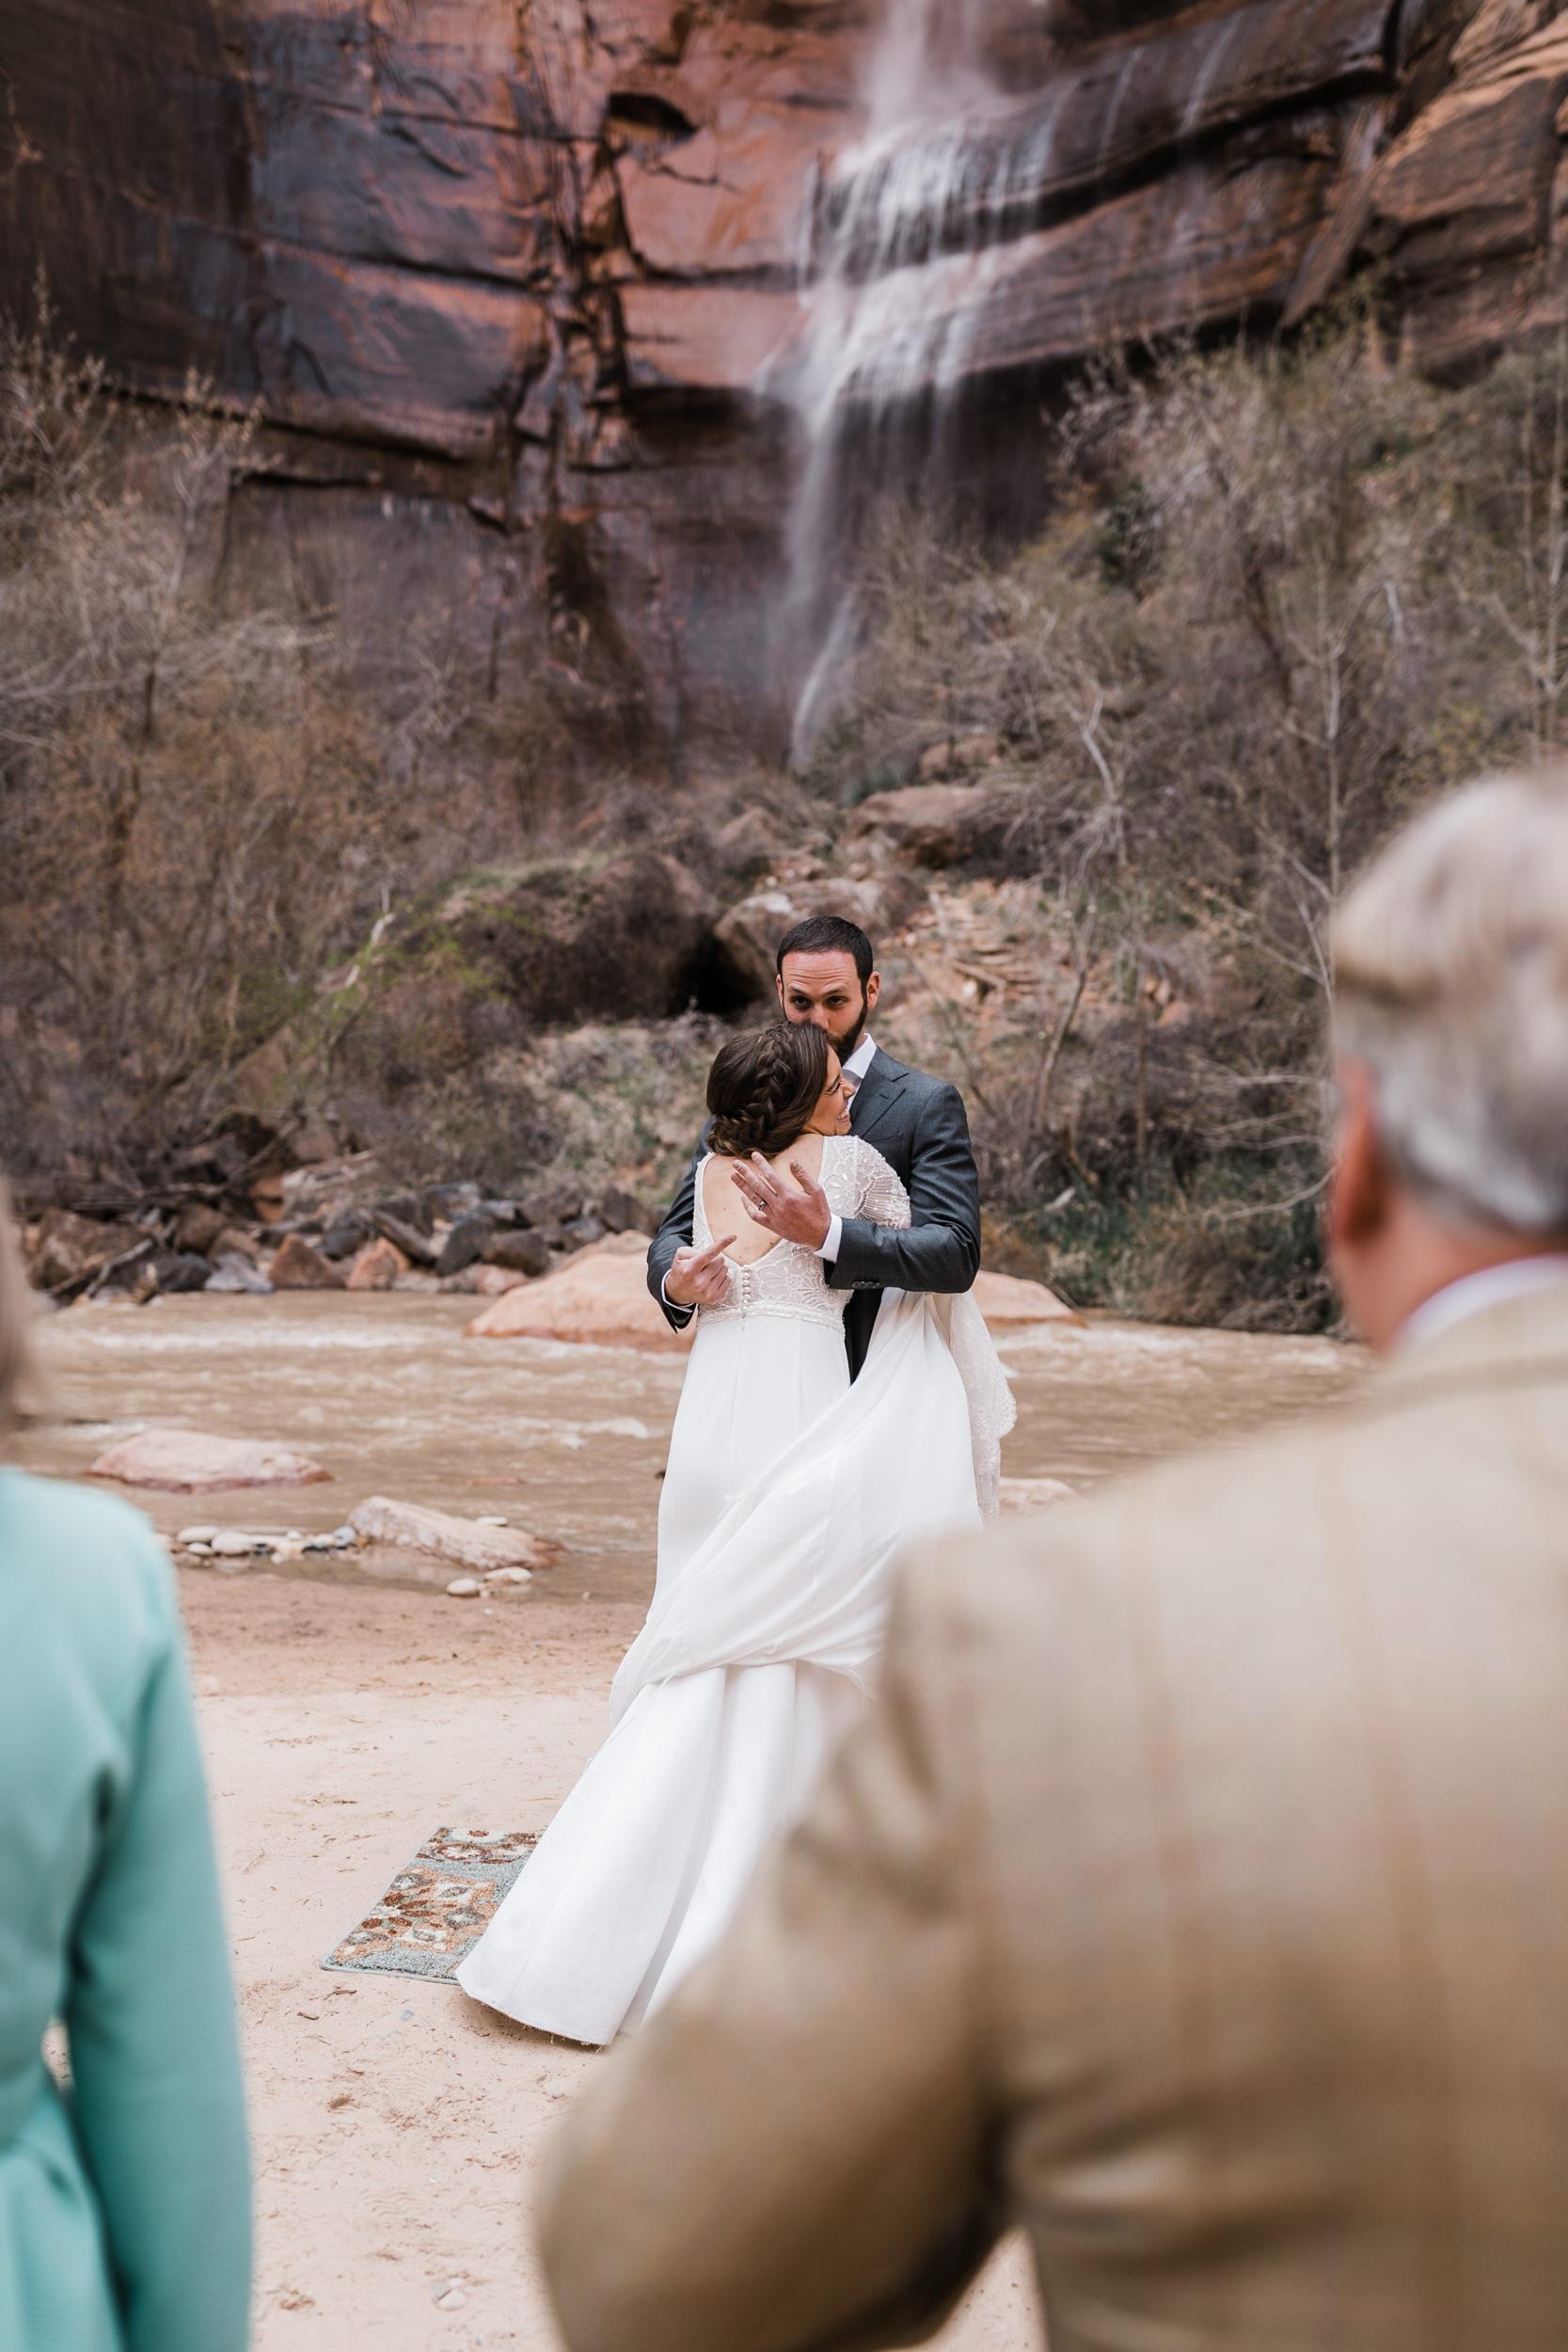 Zion-National-Park-Adventure-Wedding-Hearnes-Elopement-Photography-22.jpg